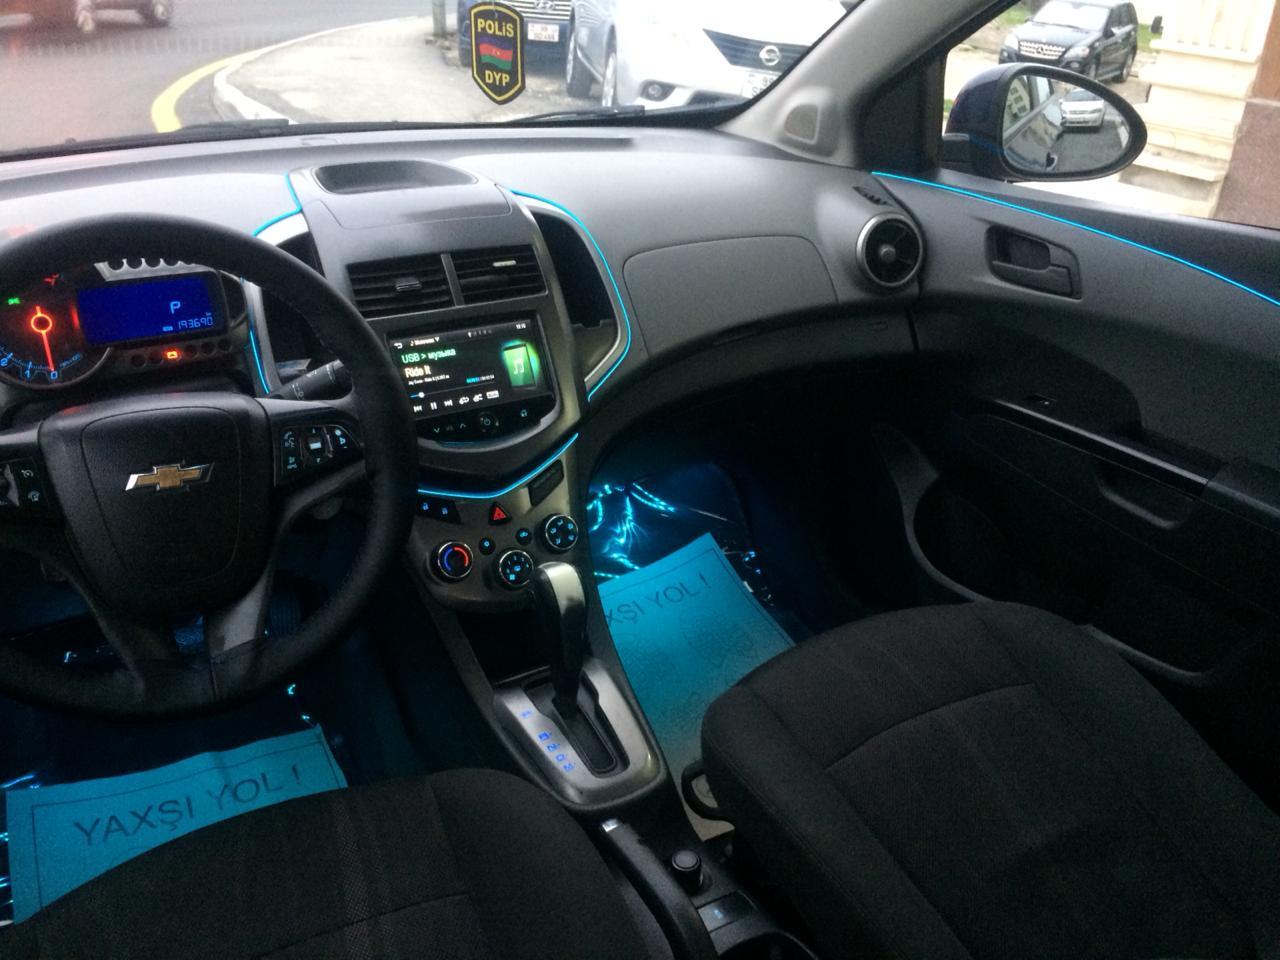 Chevrolet Aveo 1.4(lt) 2012 İkinci əl  $6000